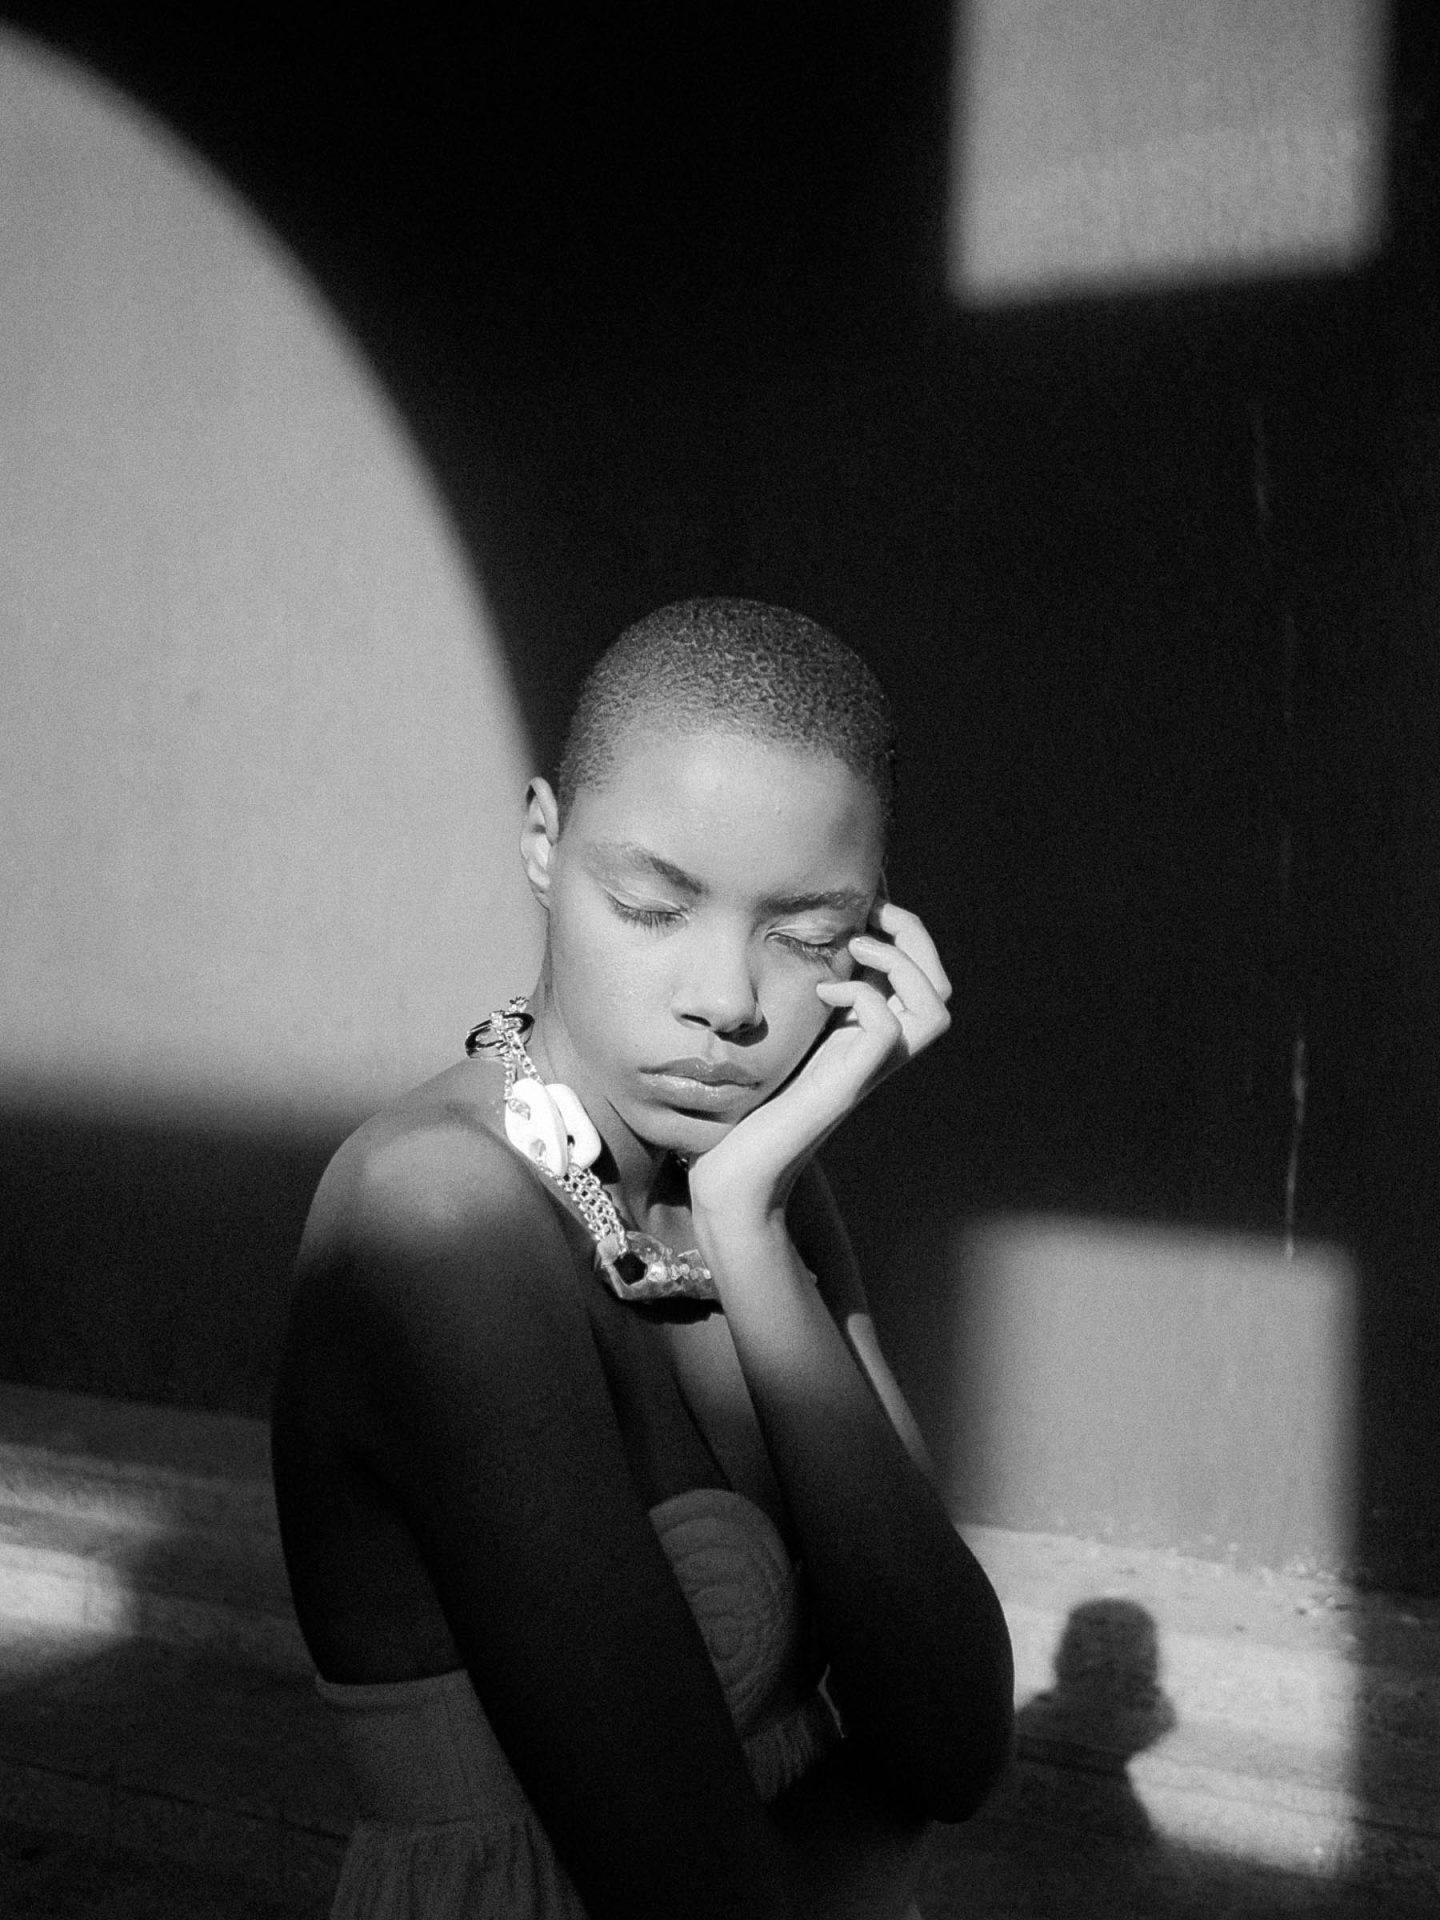 IGNANT-Photography-Edgar-Berg-21